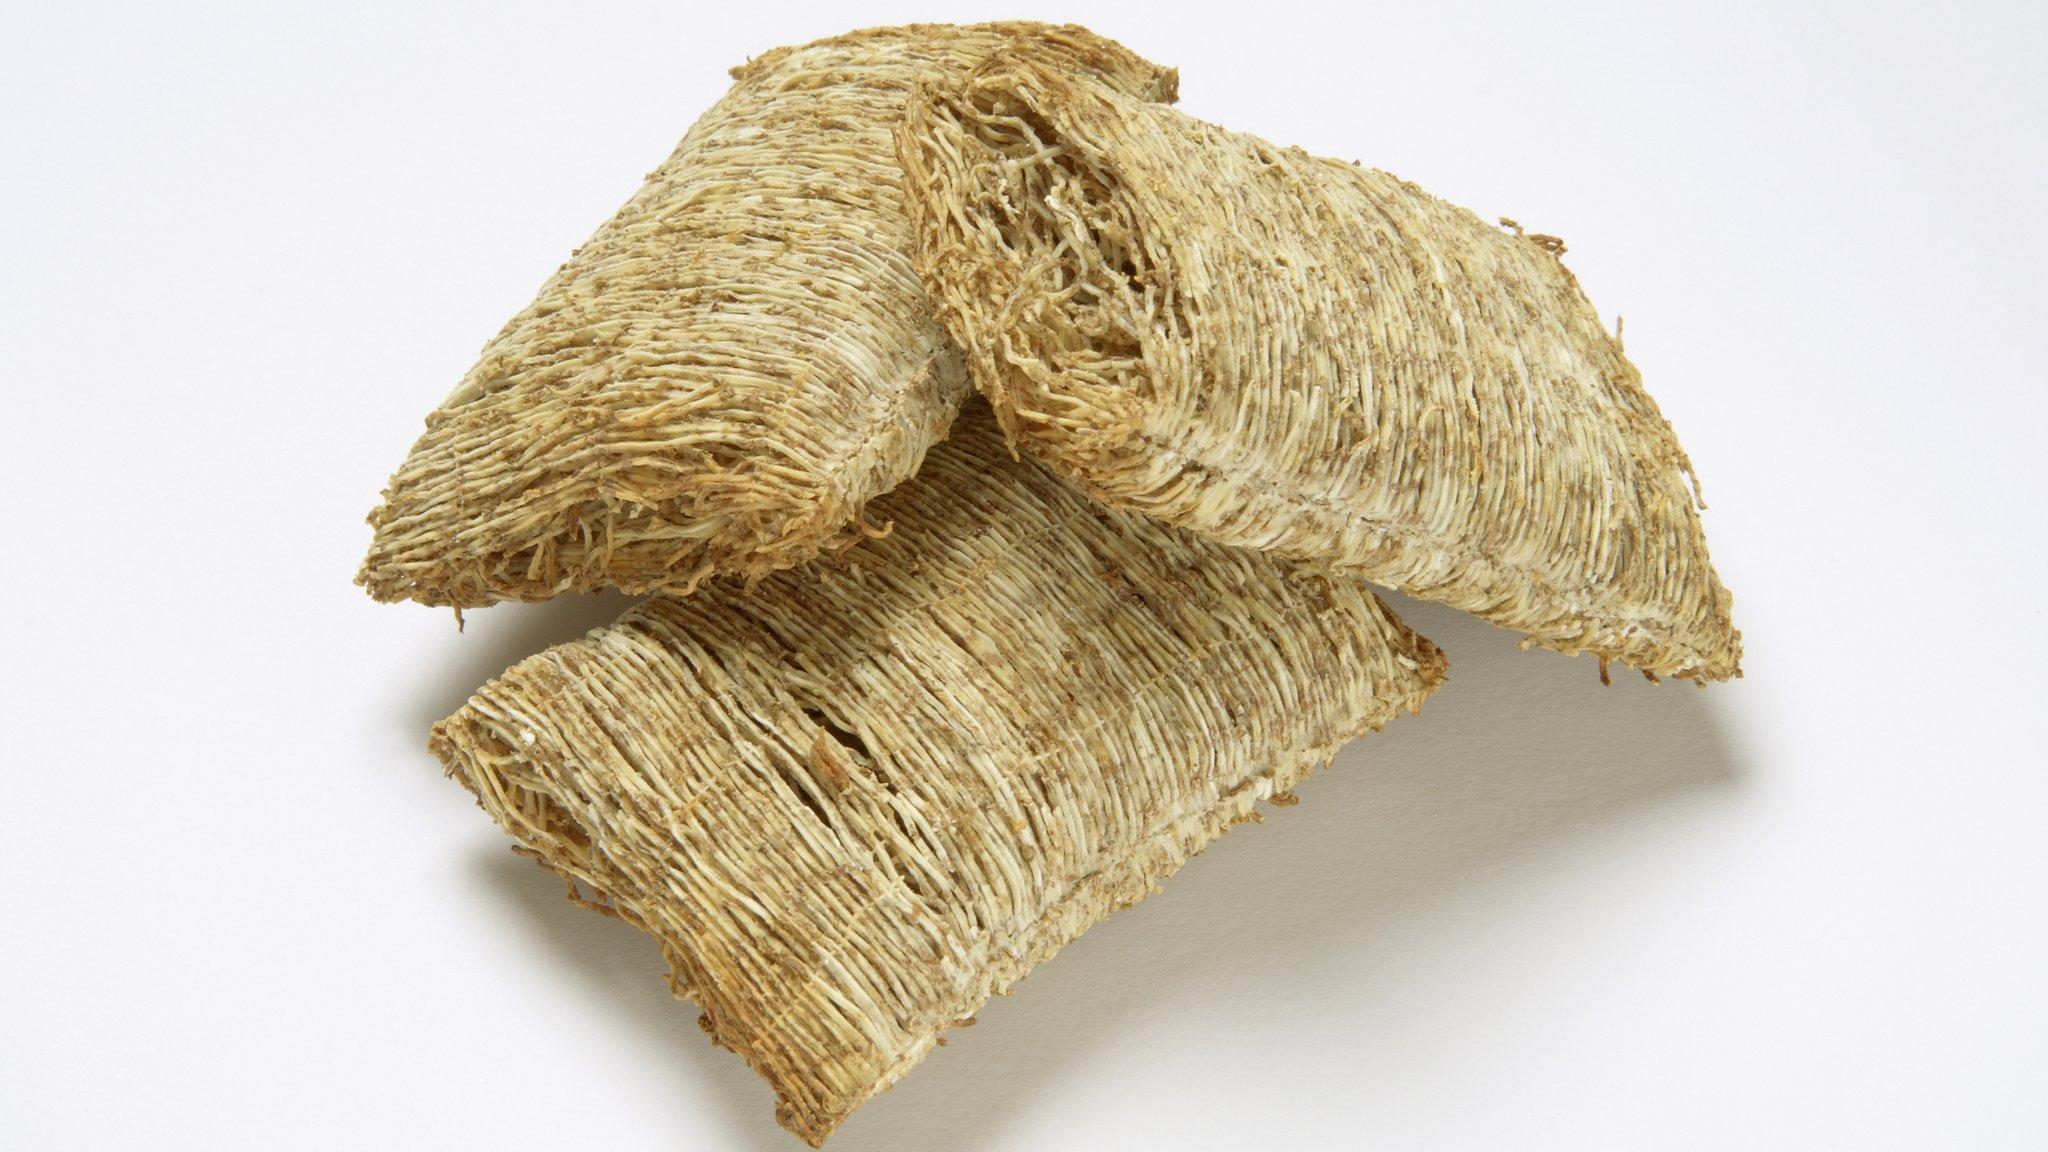 Shreeded wheat